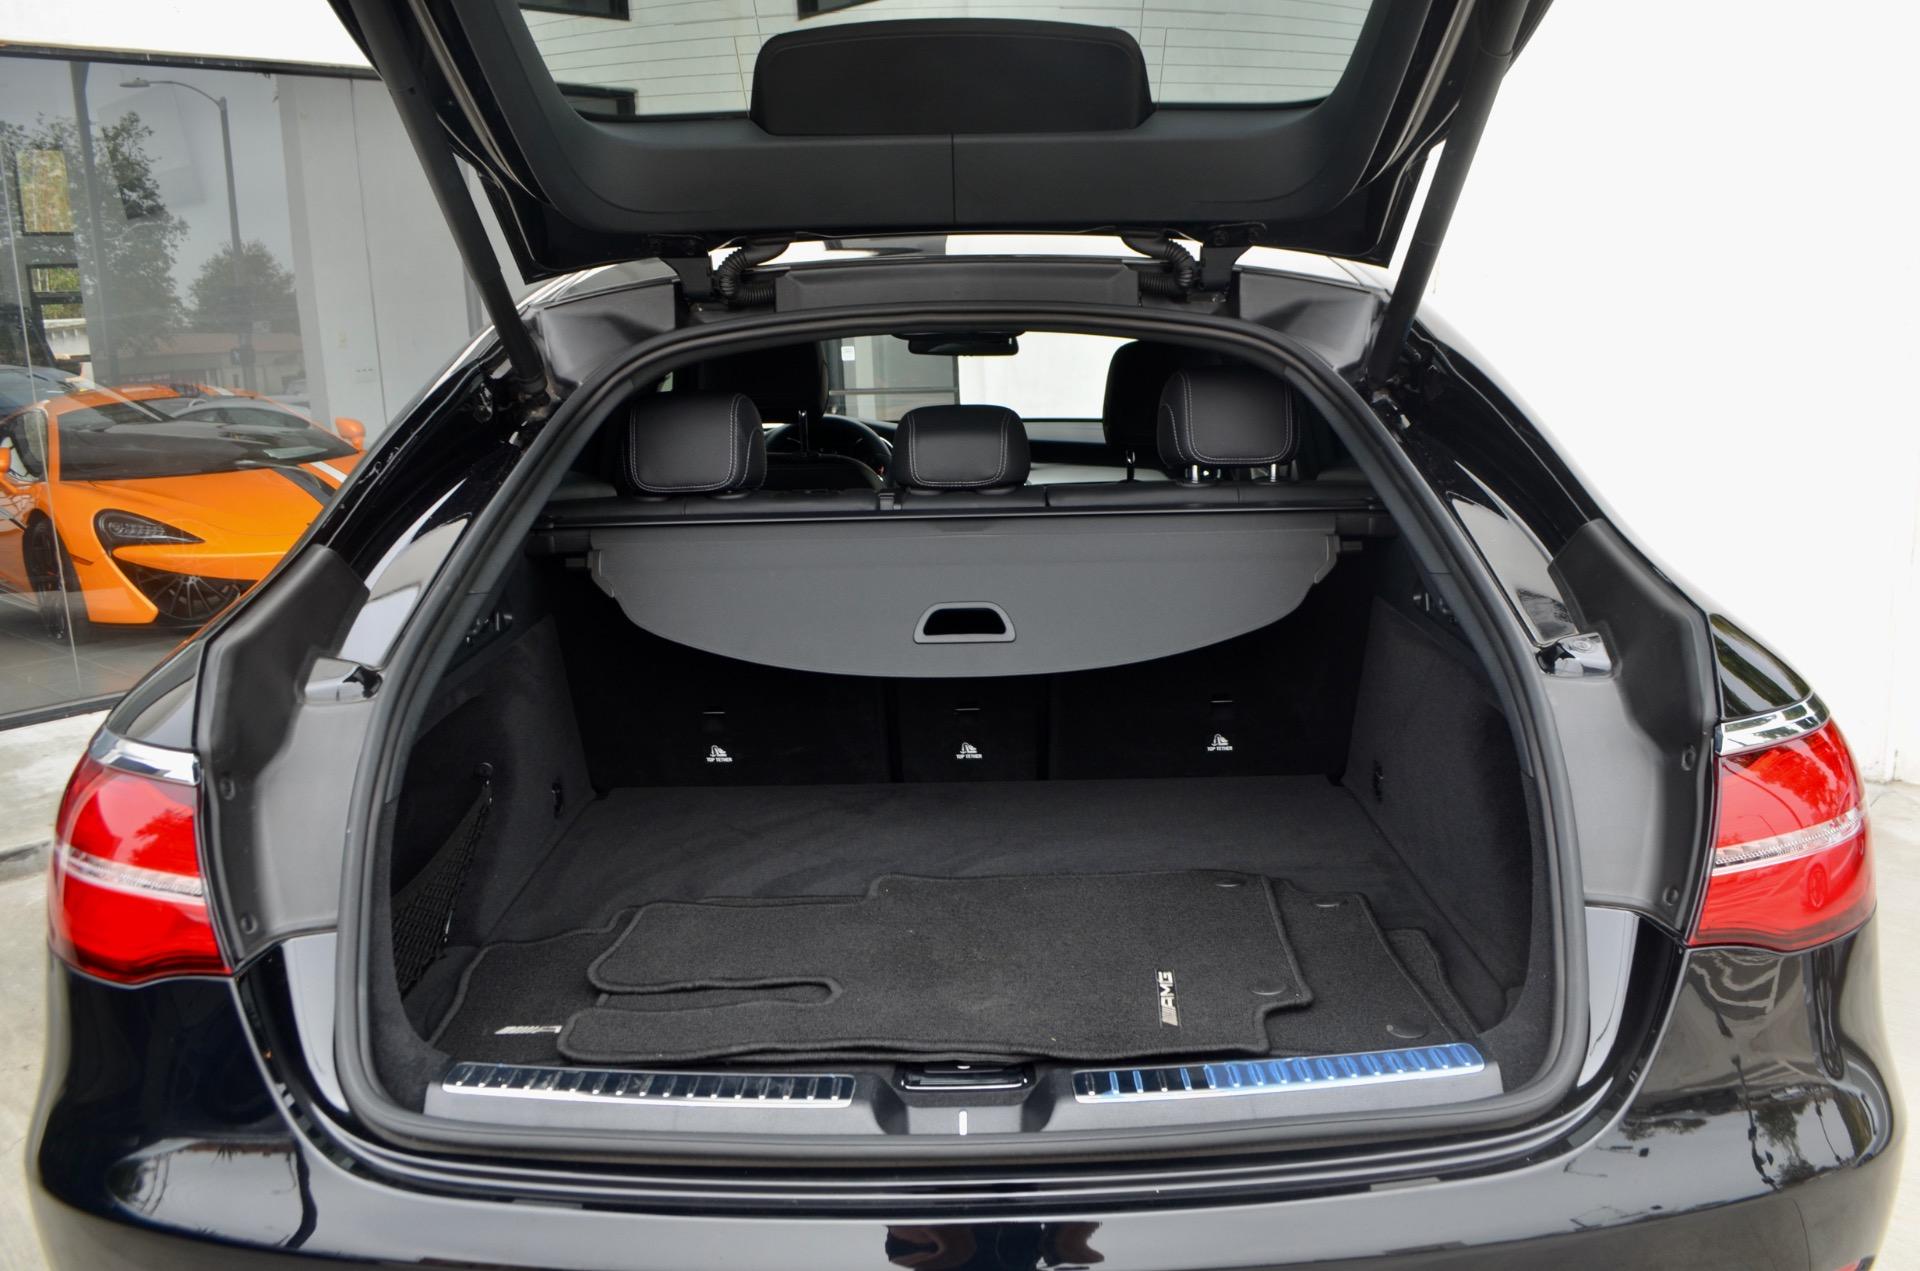 Used-2019-Mercedes-Benz-GLC-GLC-300-4MATIC